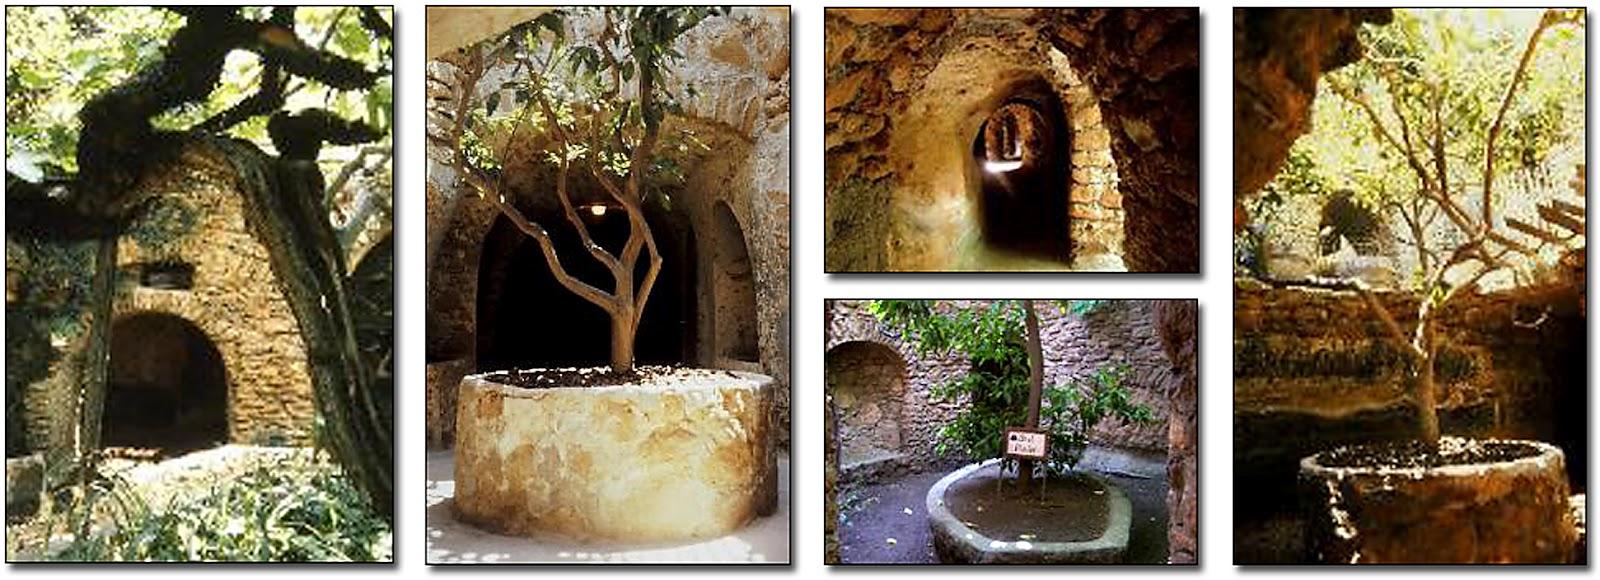 Il Regno: Baldassare Forestiere and his Underground Gardens